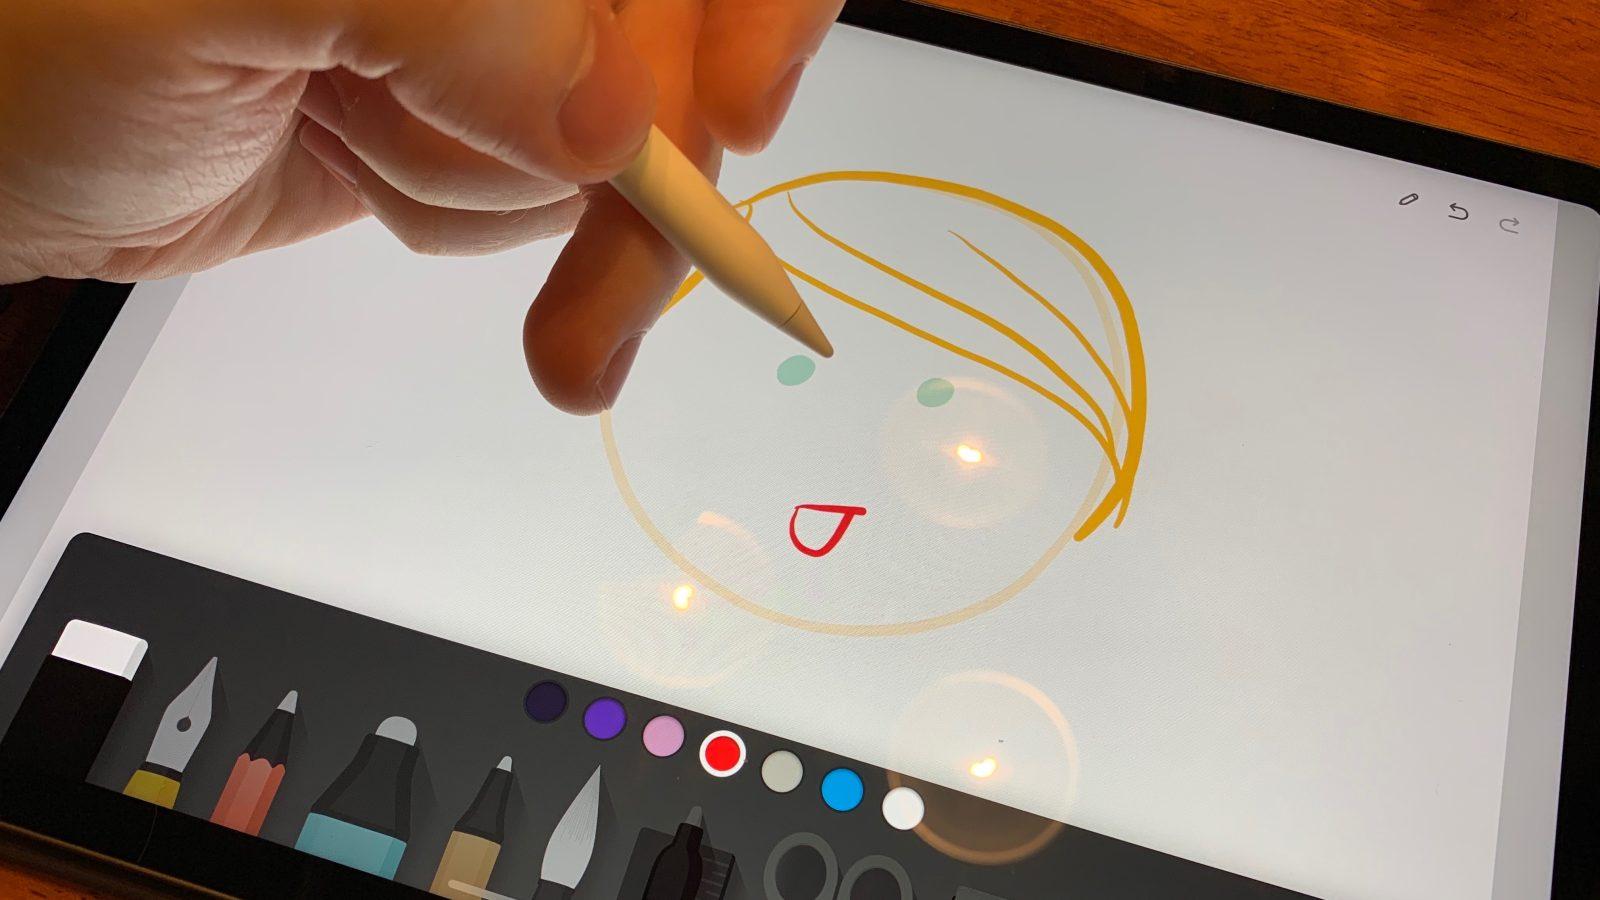 ipad sketching app paper